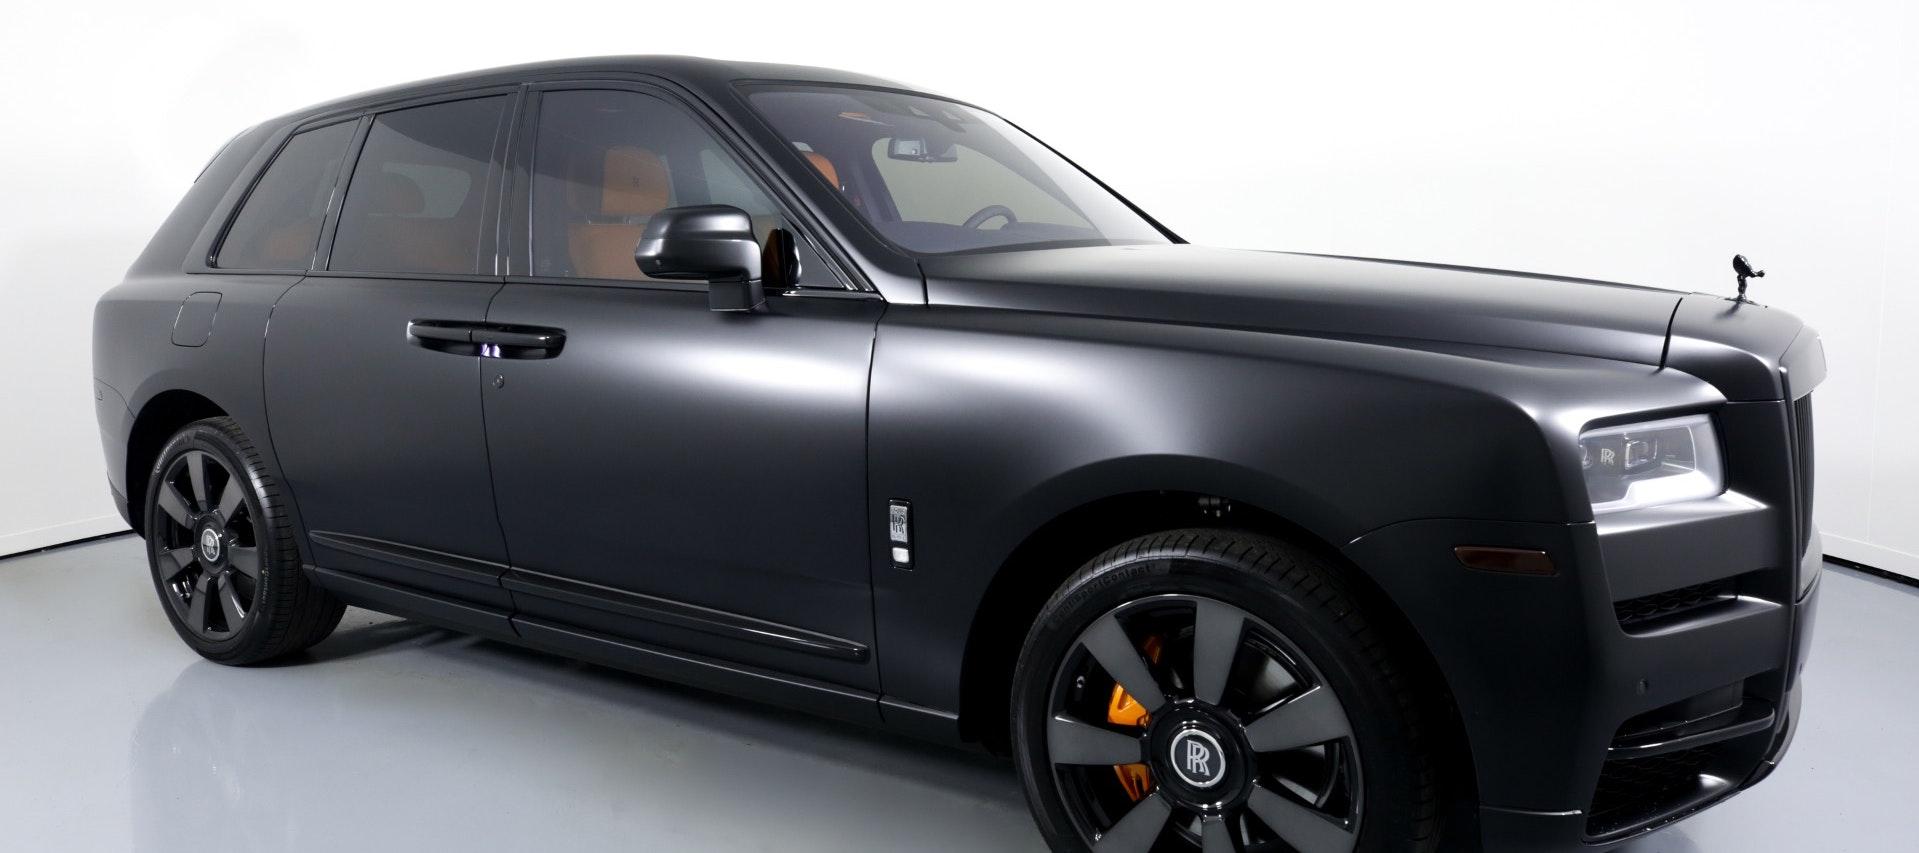 2020 Rolls Royce Cullinan for rent in Miami